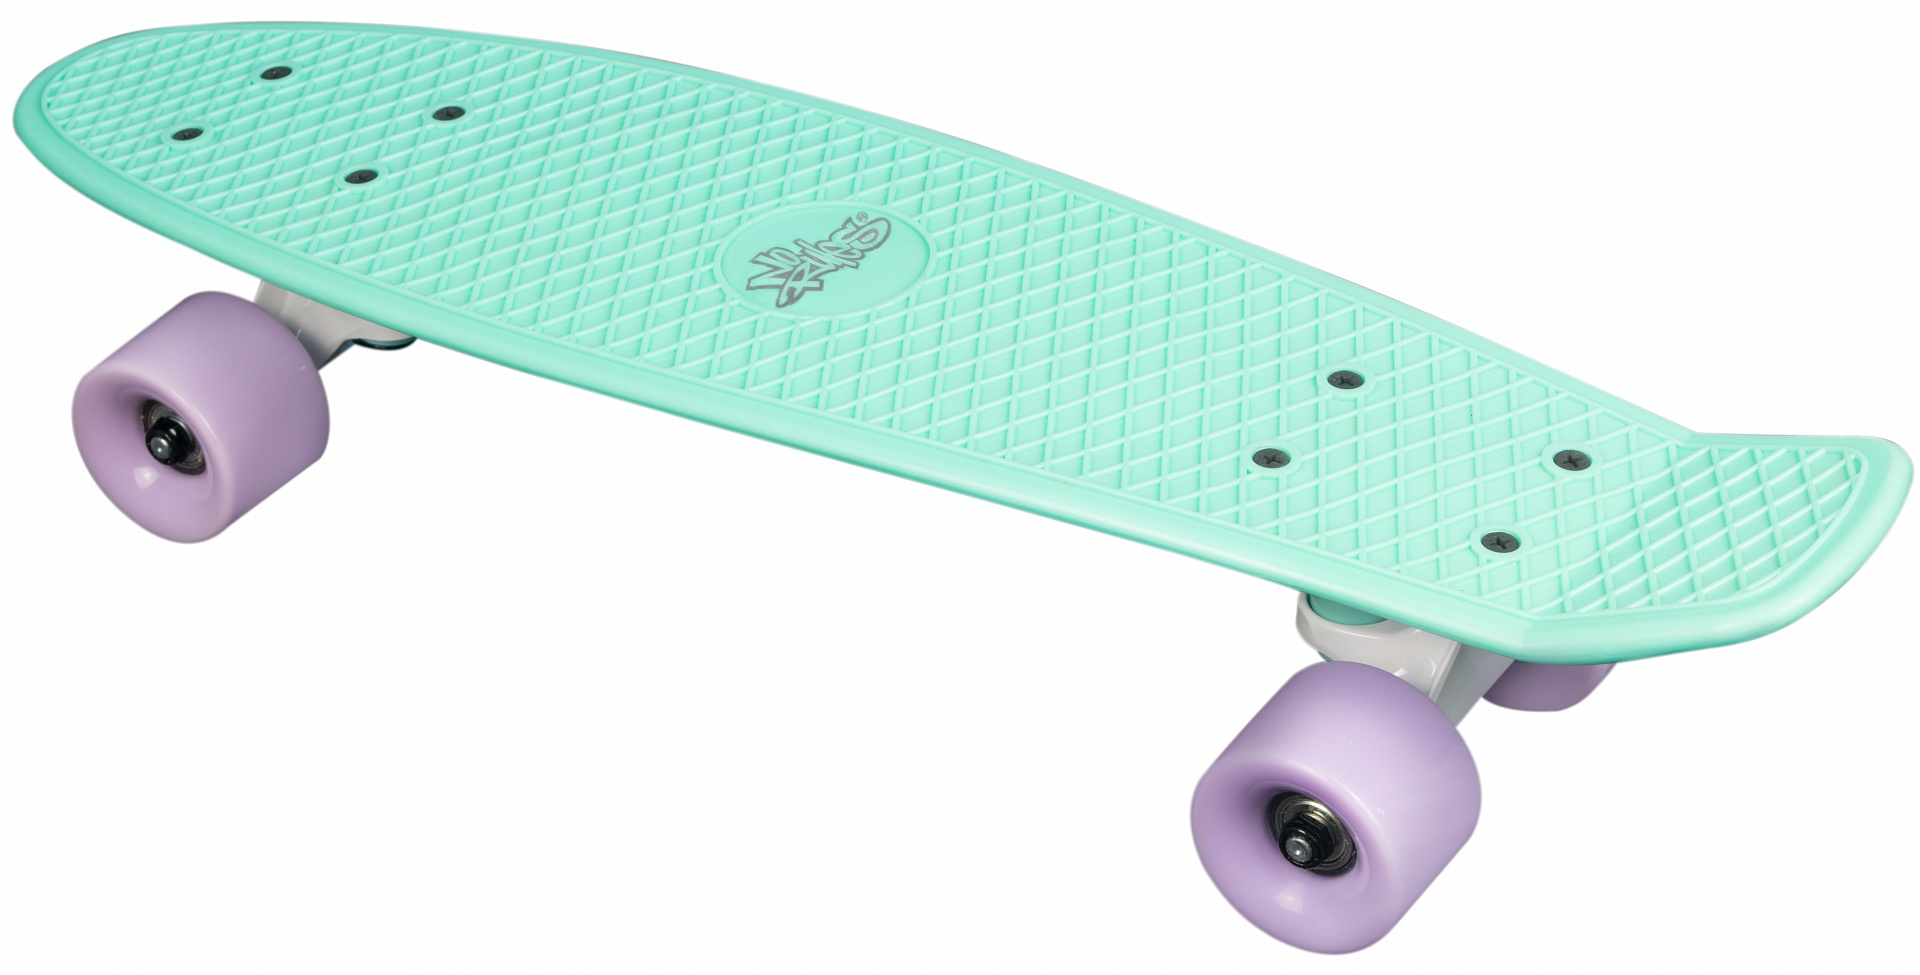 No Rules Skateboard fun skrituļdēlis MINT-PURBLE AU 354